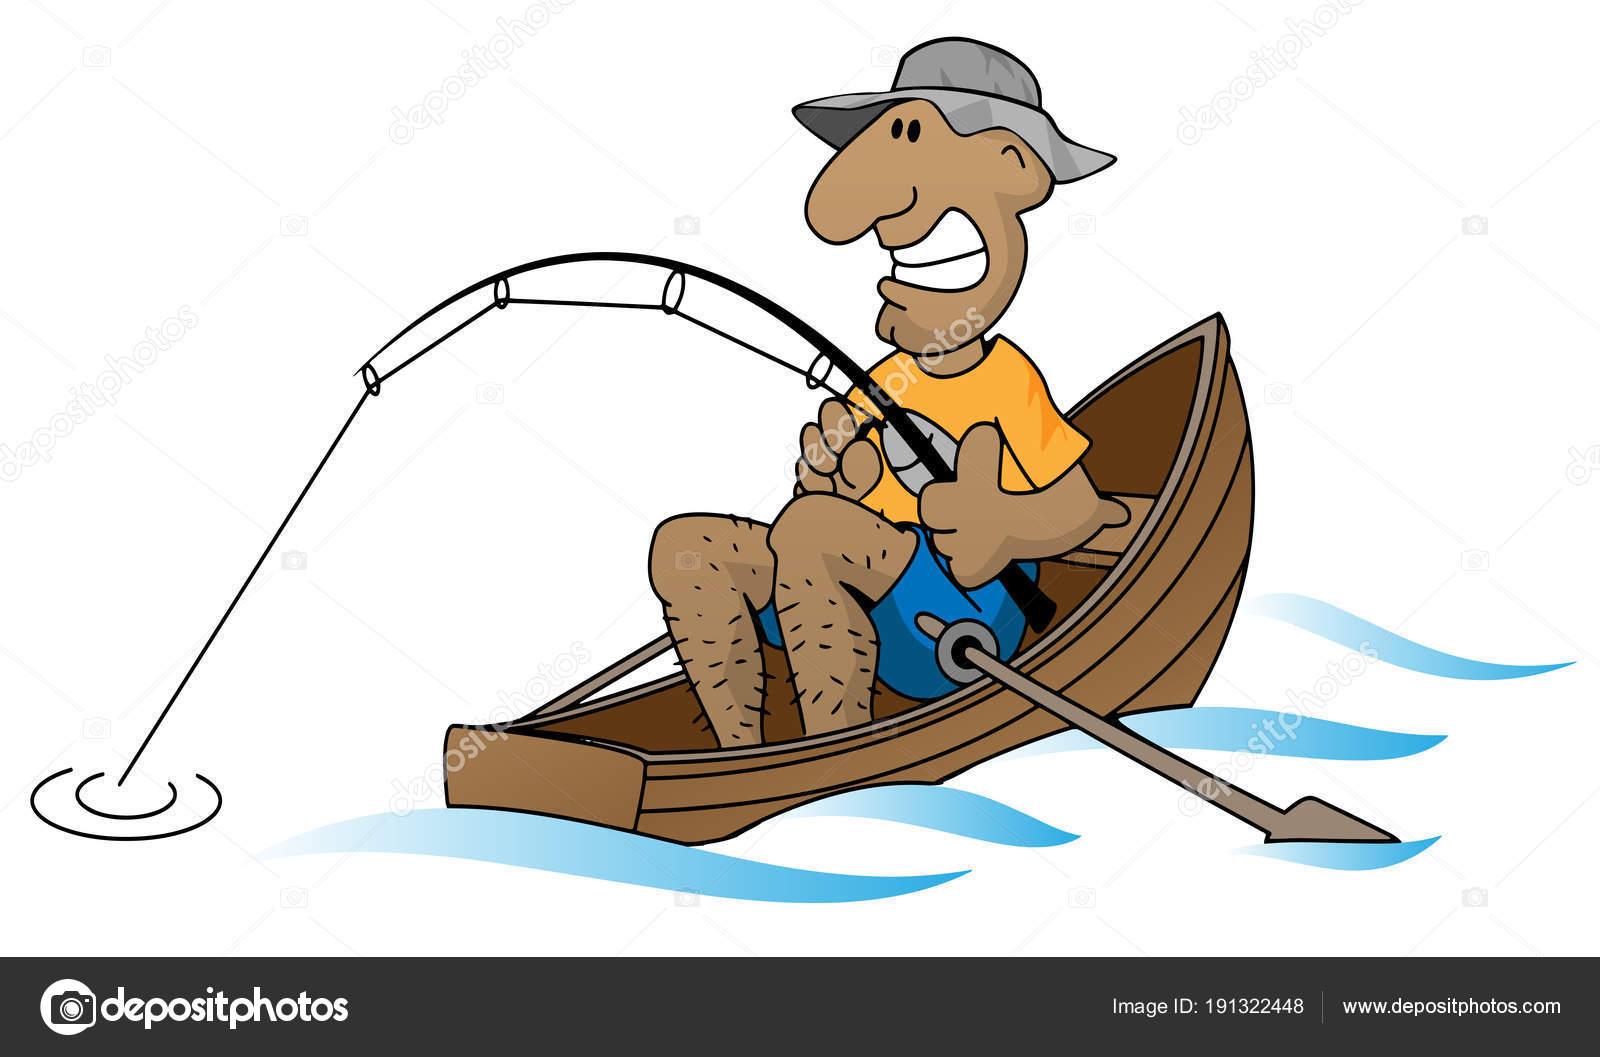 Duck Fish Stock Illustrations – 1,840 Duck Fish Stock Illustrations,  Vectors & Clipart - Dreamstime